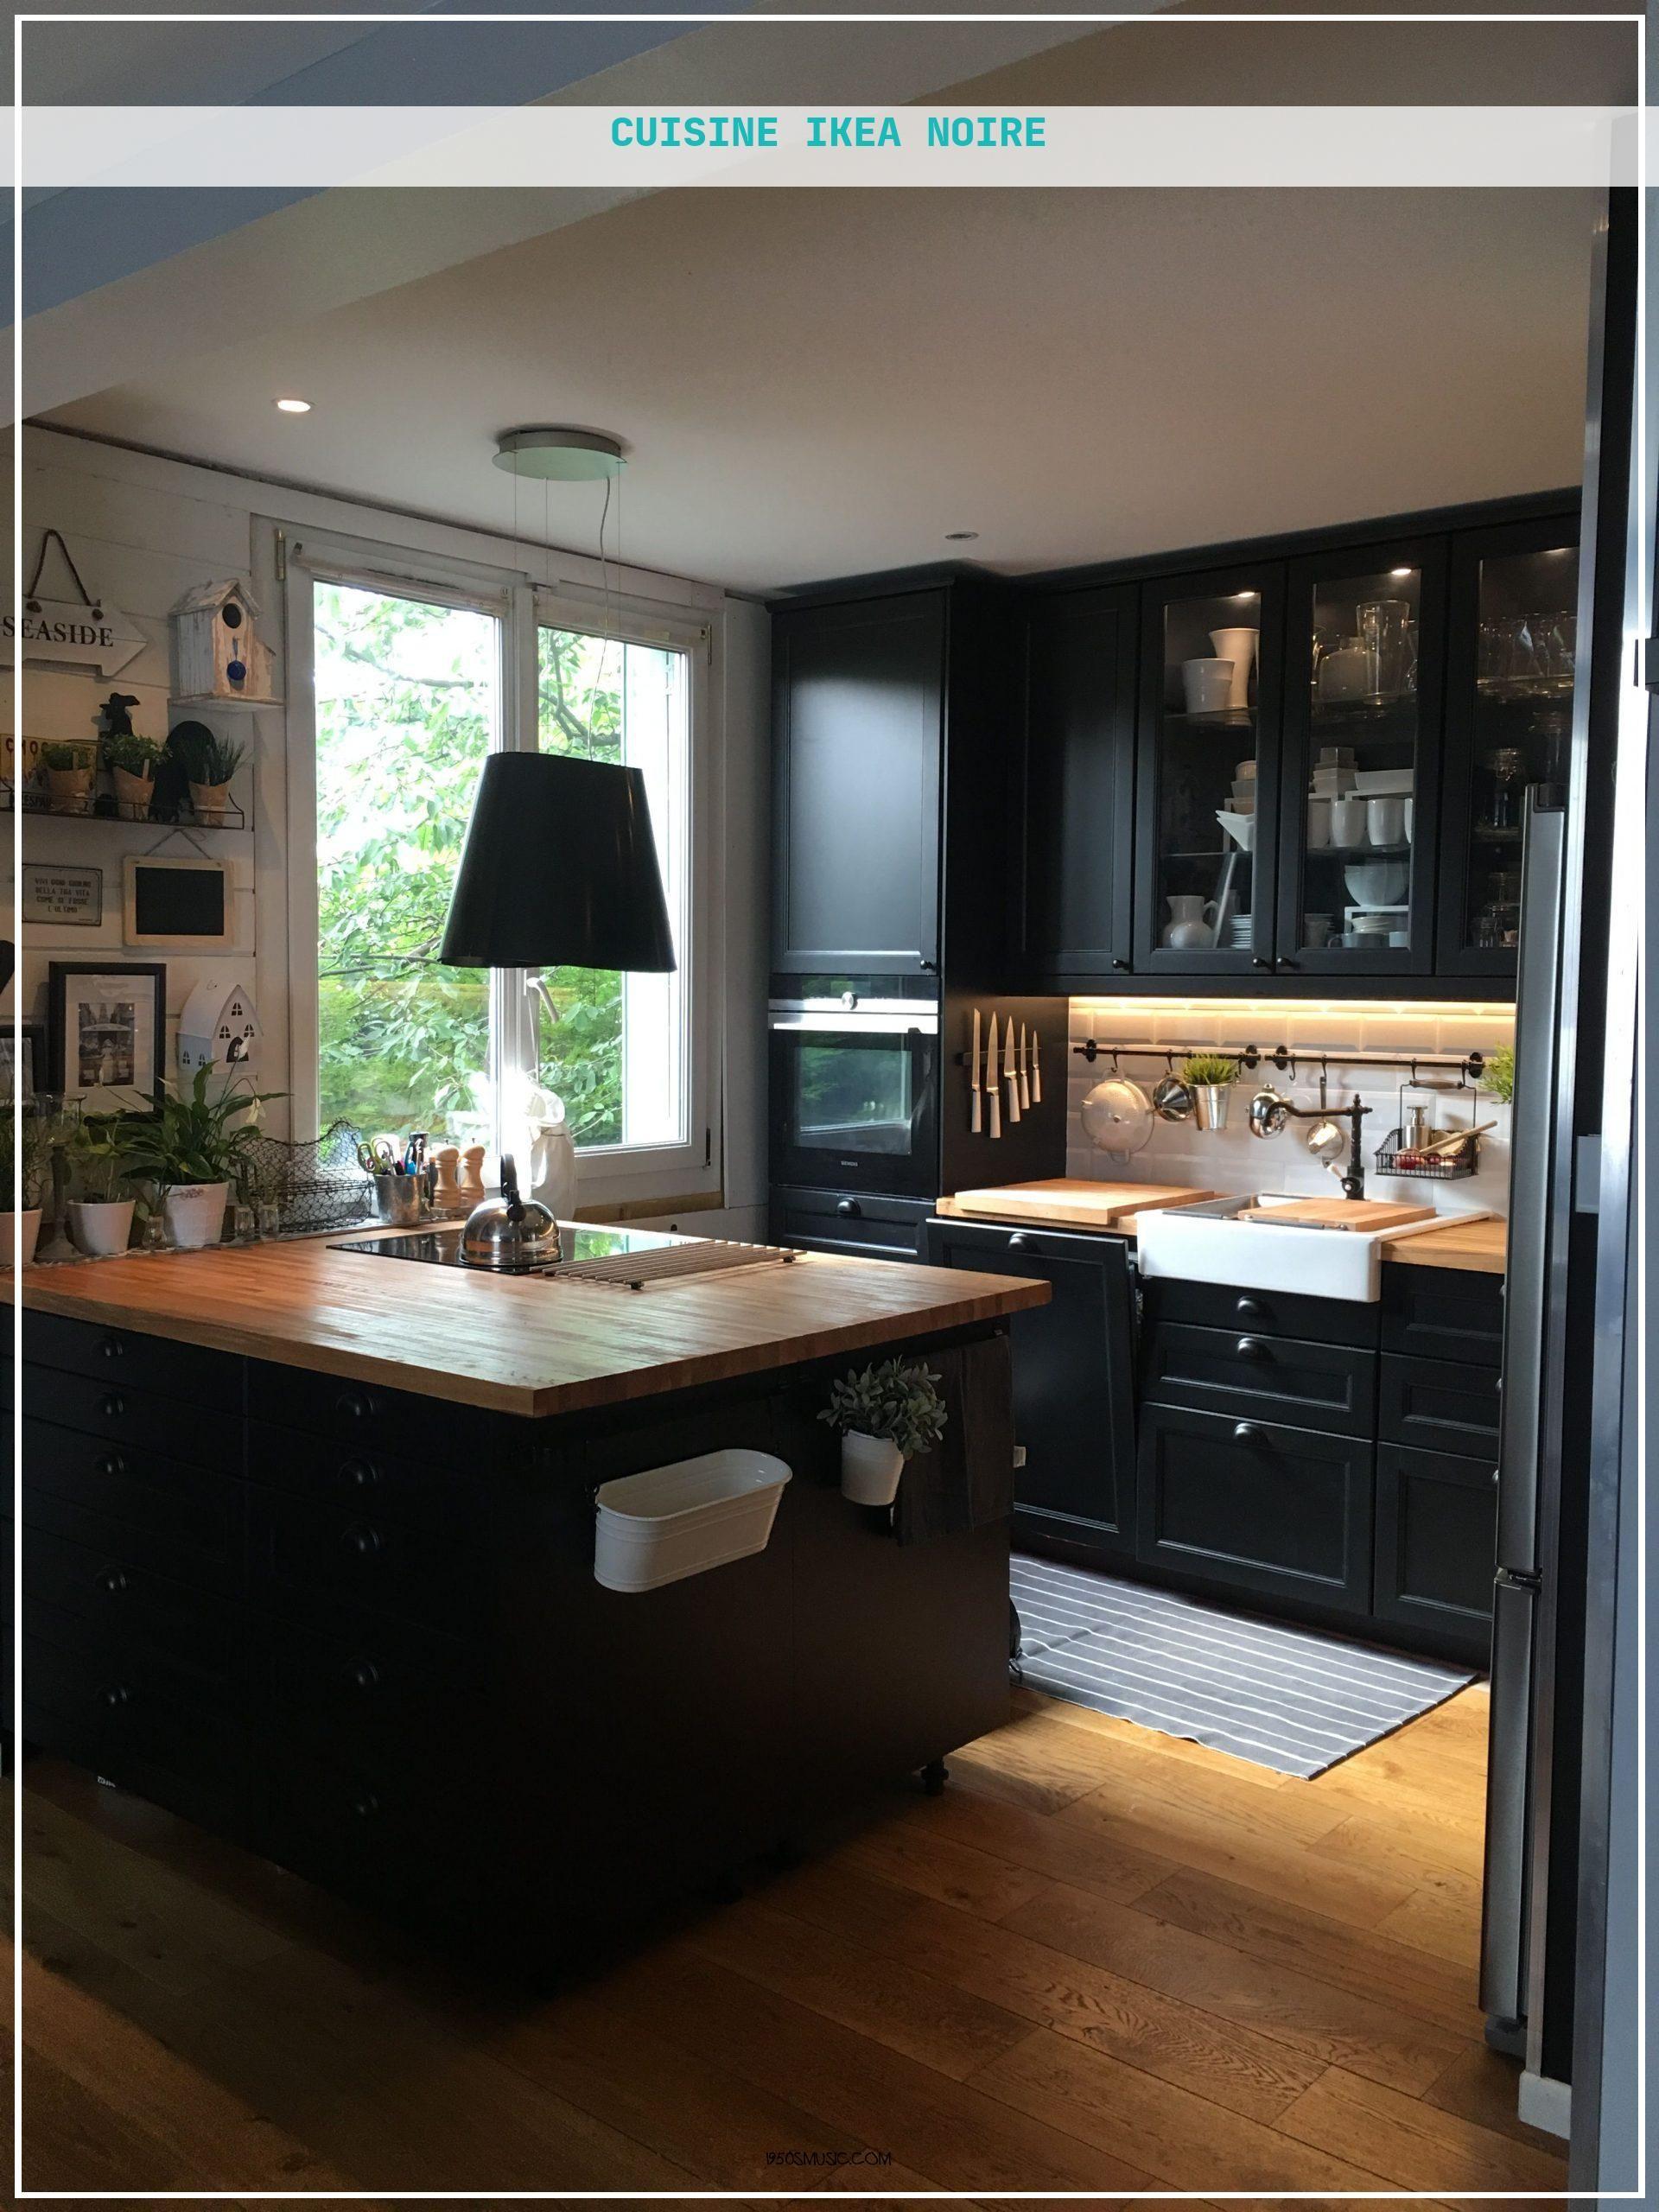 Cuisine Ikea Noire en 15  Cuisine ikea noire, Cuisine ikea